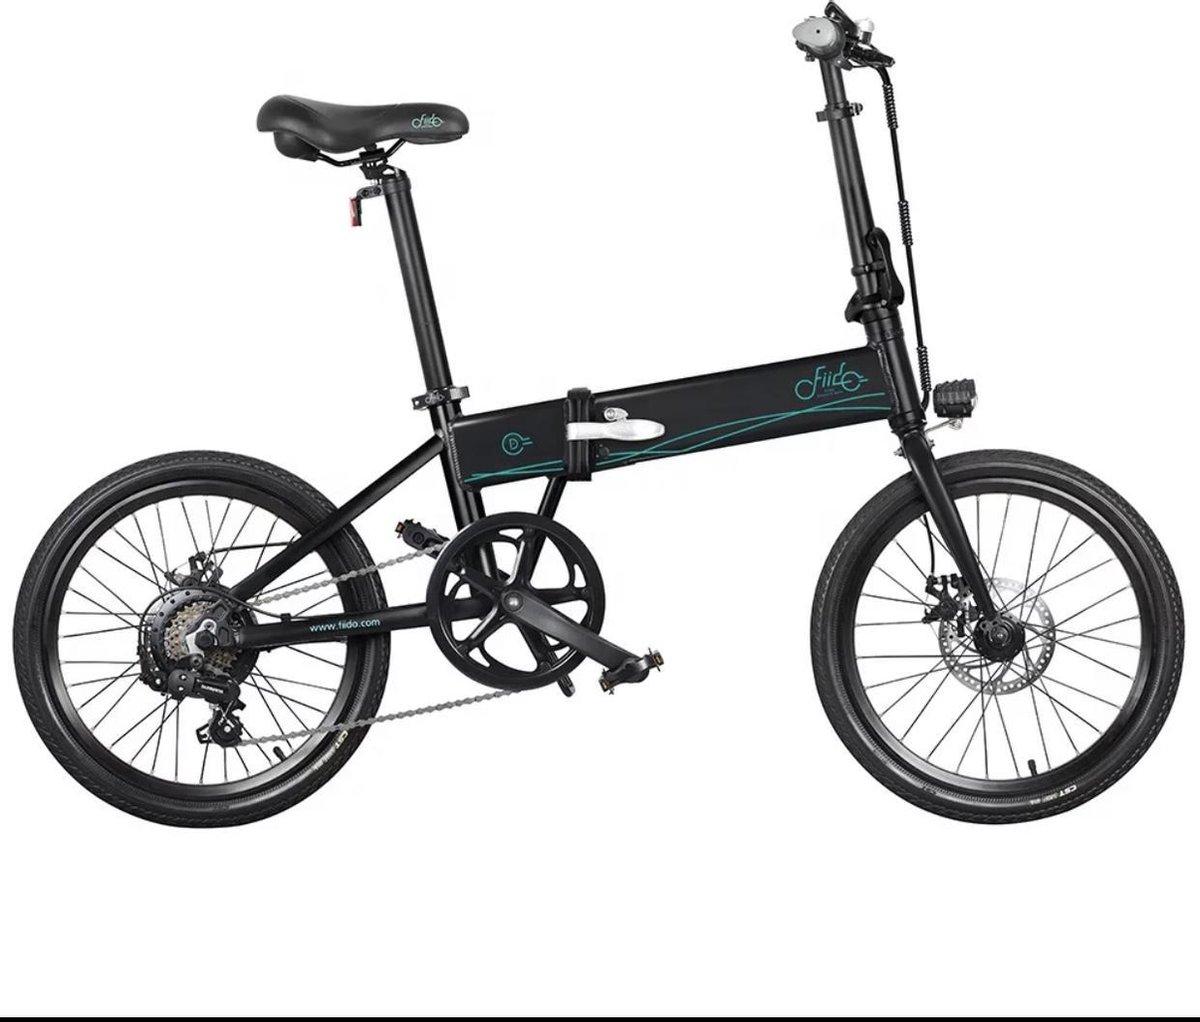 Matrix E Bike FIIDO D4s 6 Speed - Elektrische Vouwfiets - Zwart - 25 km per uur - 20 Inch - 10.4 Ah